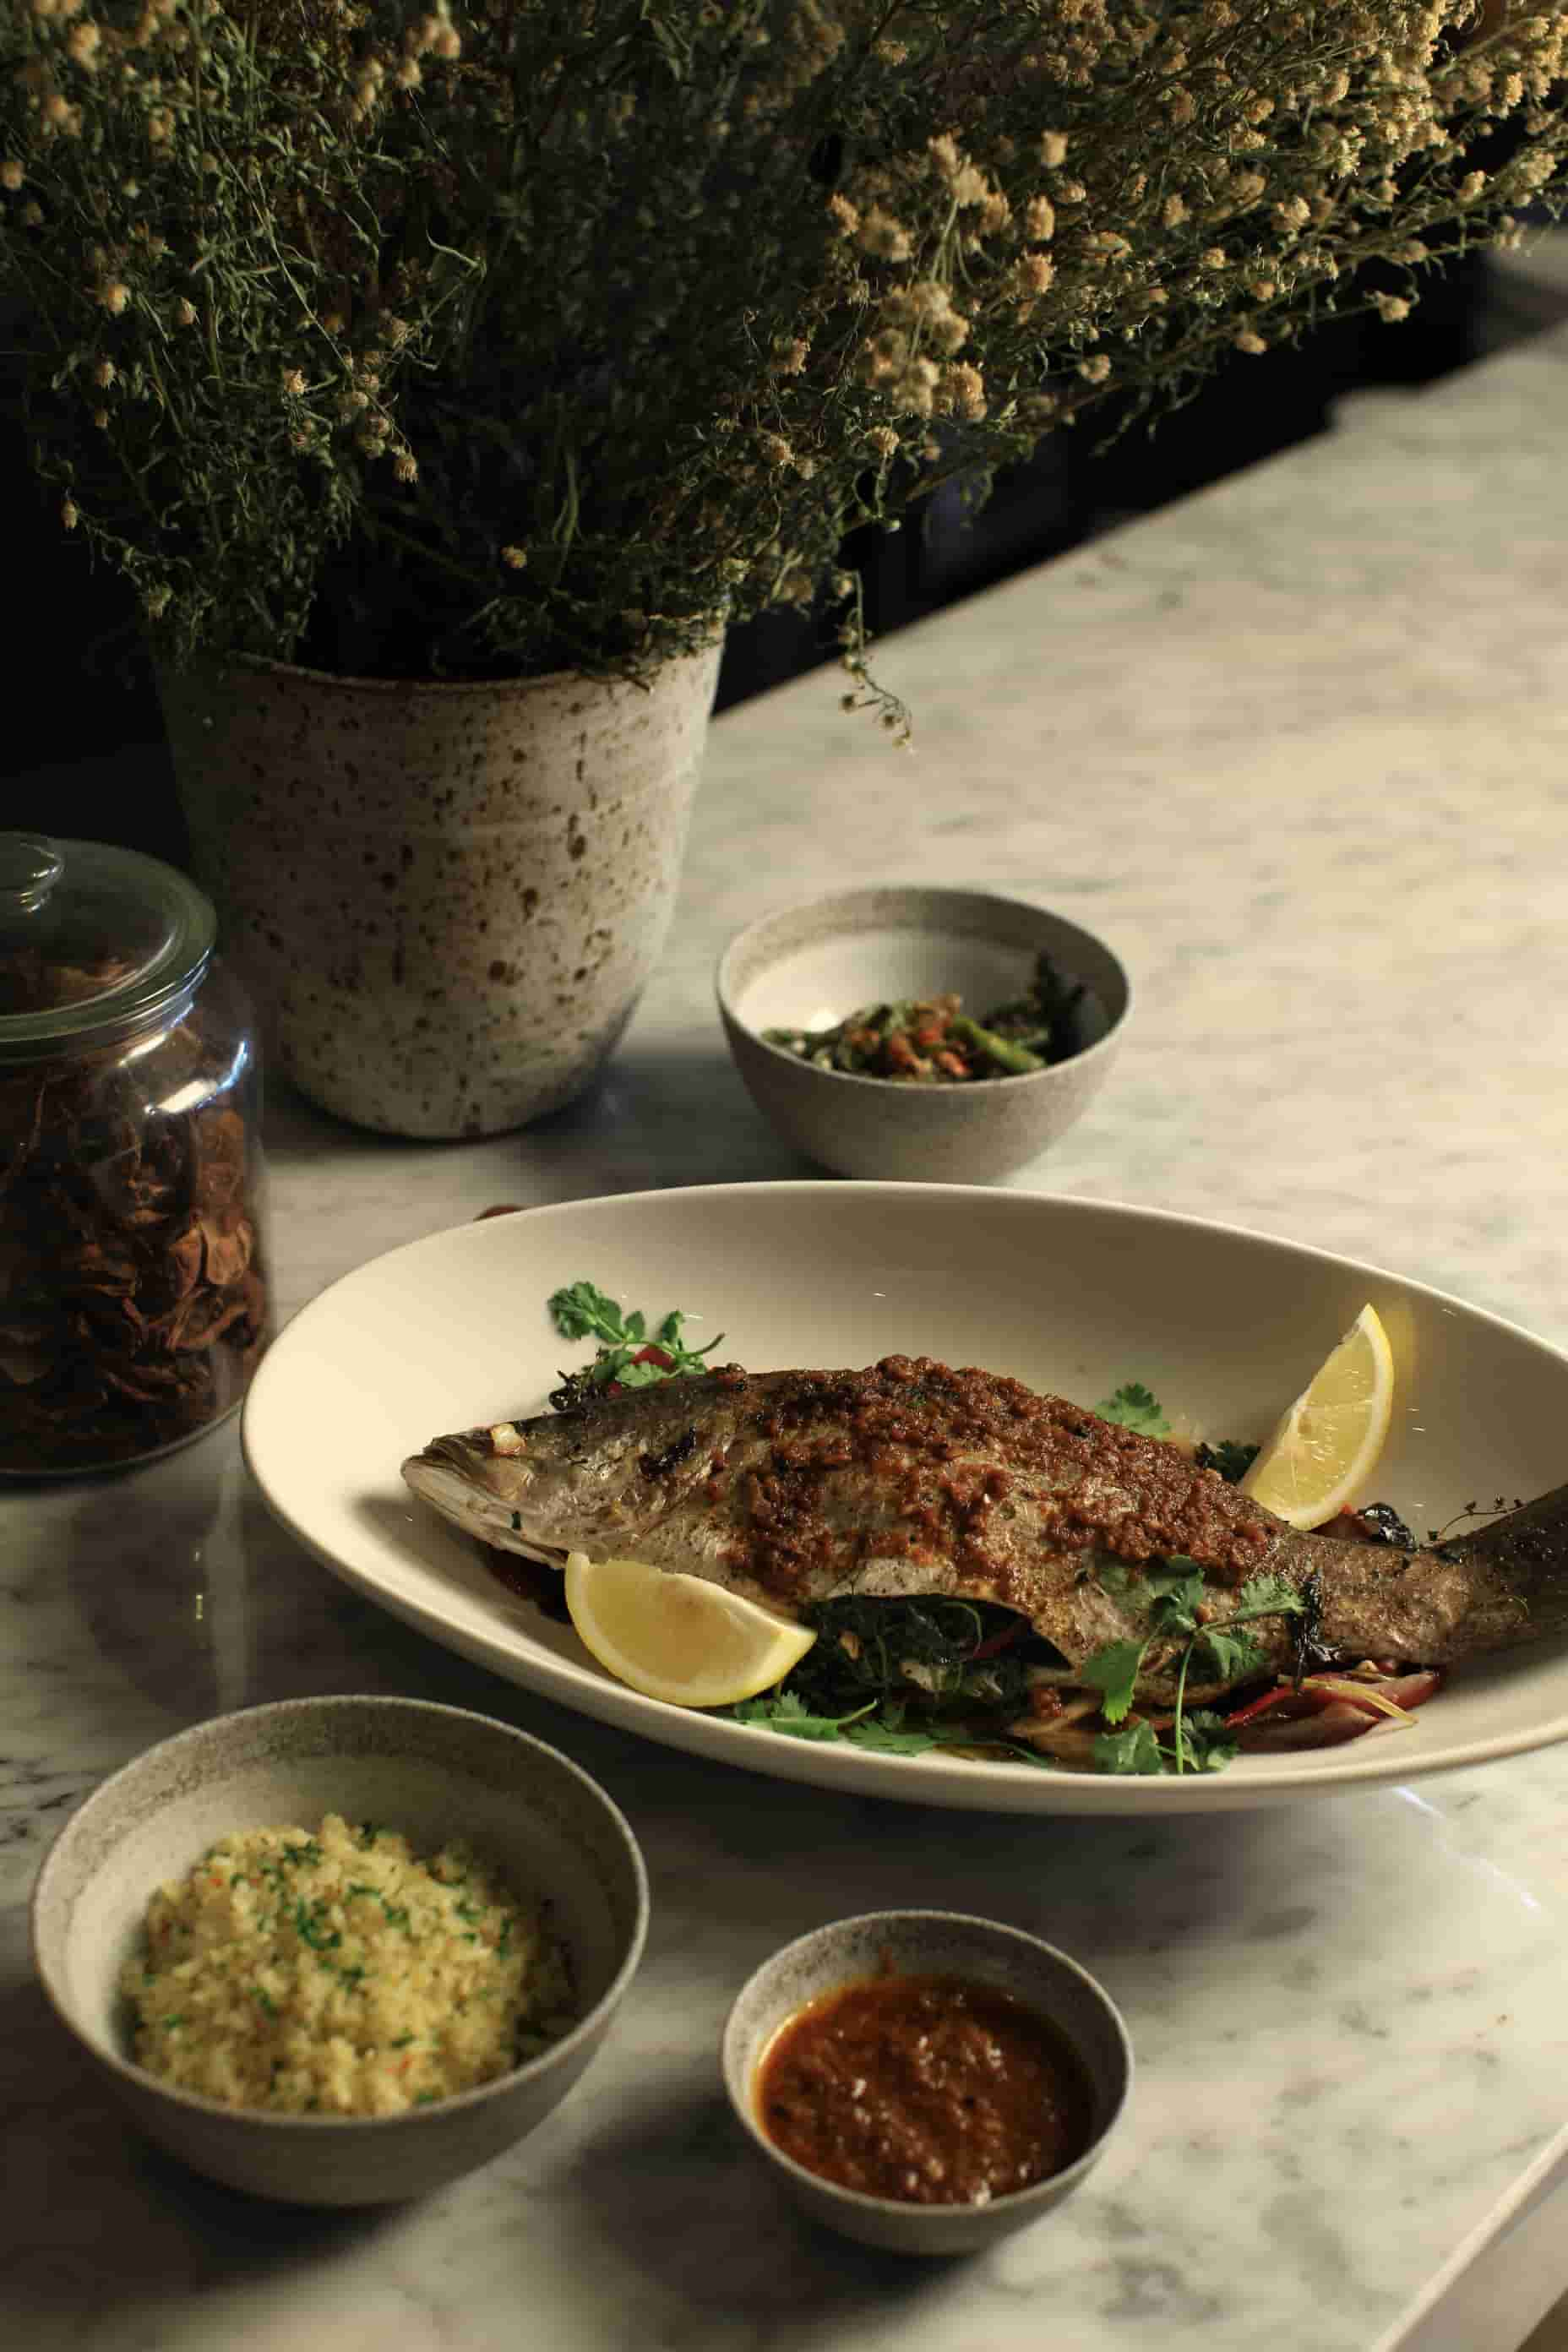 Resep Masak Ikan ala Chef Profesional (I)